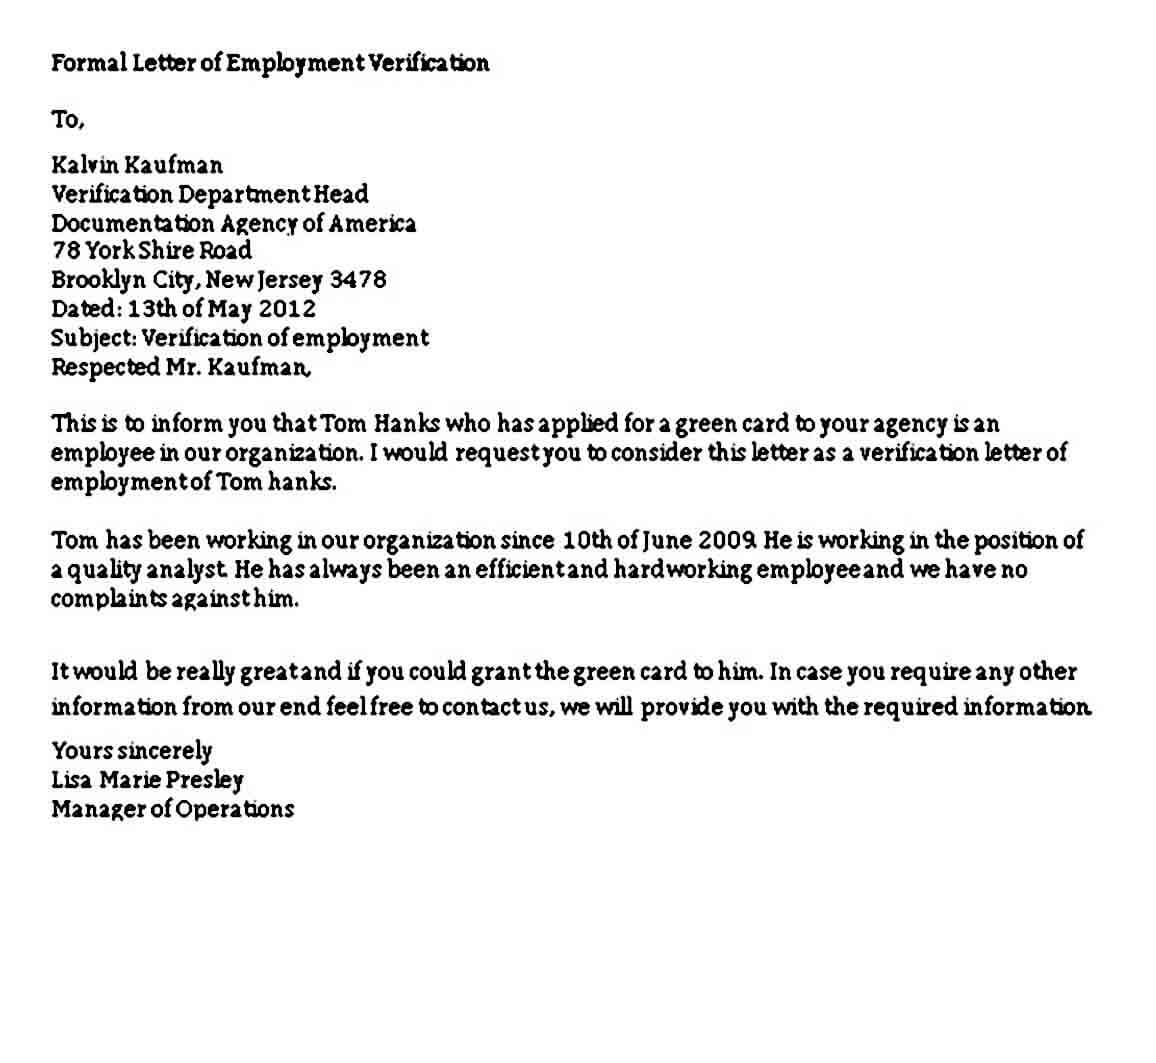 Formal Letter of Employment Verification